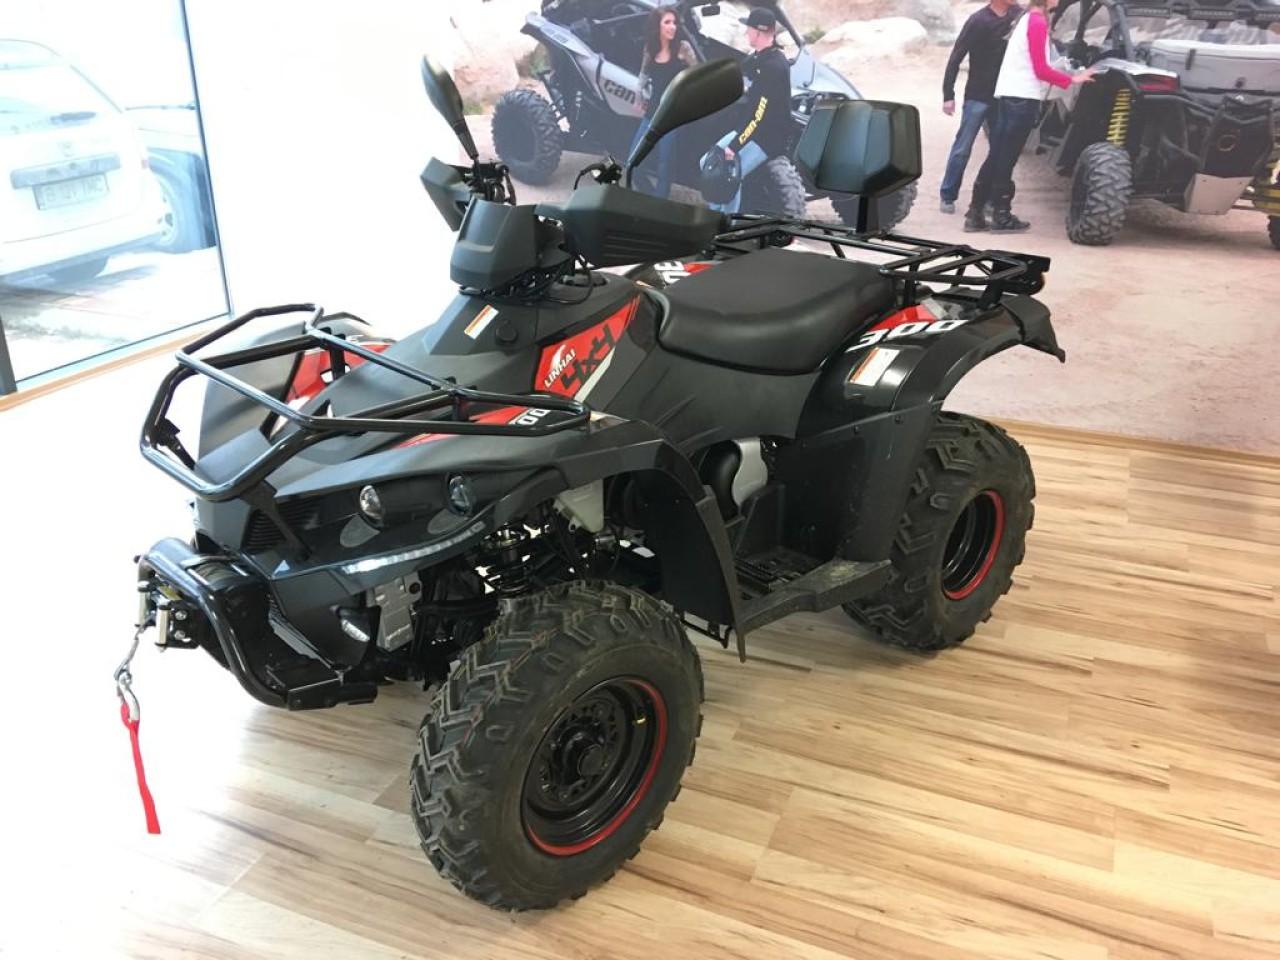 ATV Linhai DragonFly 300 S 4x4 (cf moto, tgb, can-am)